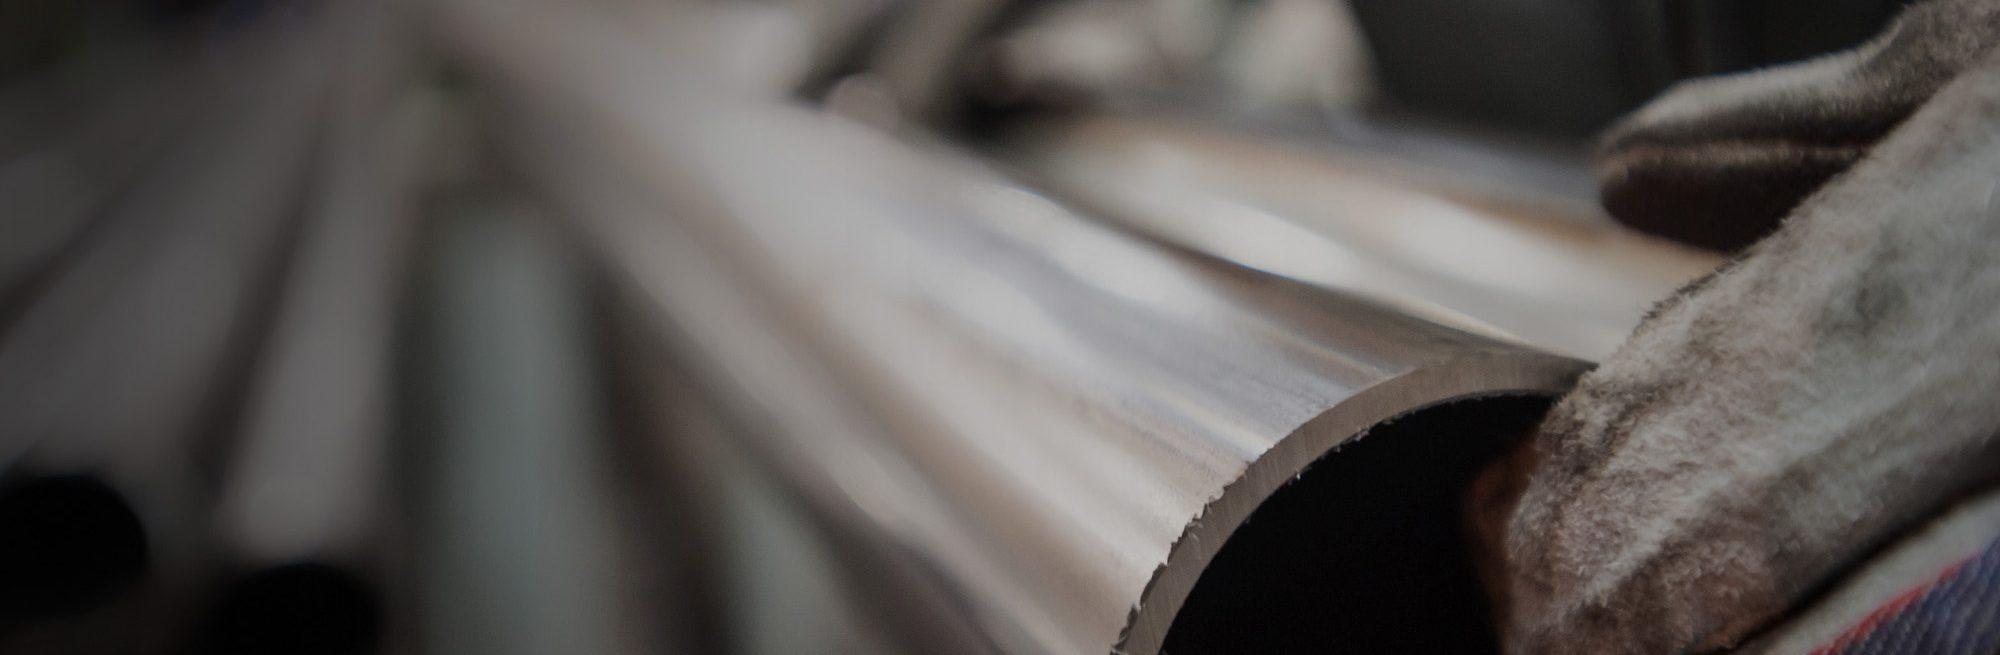 Stainless Steel Tubing Training Video Series